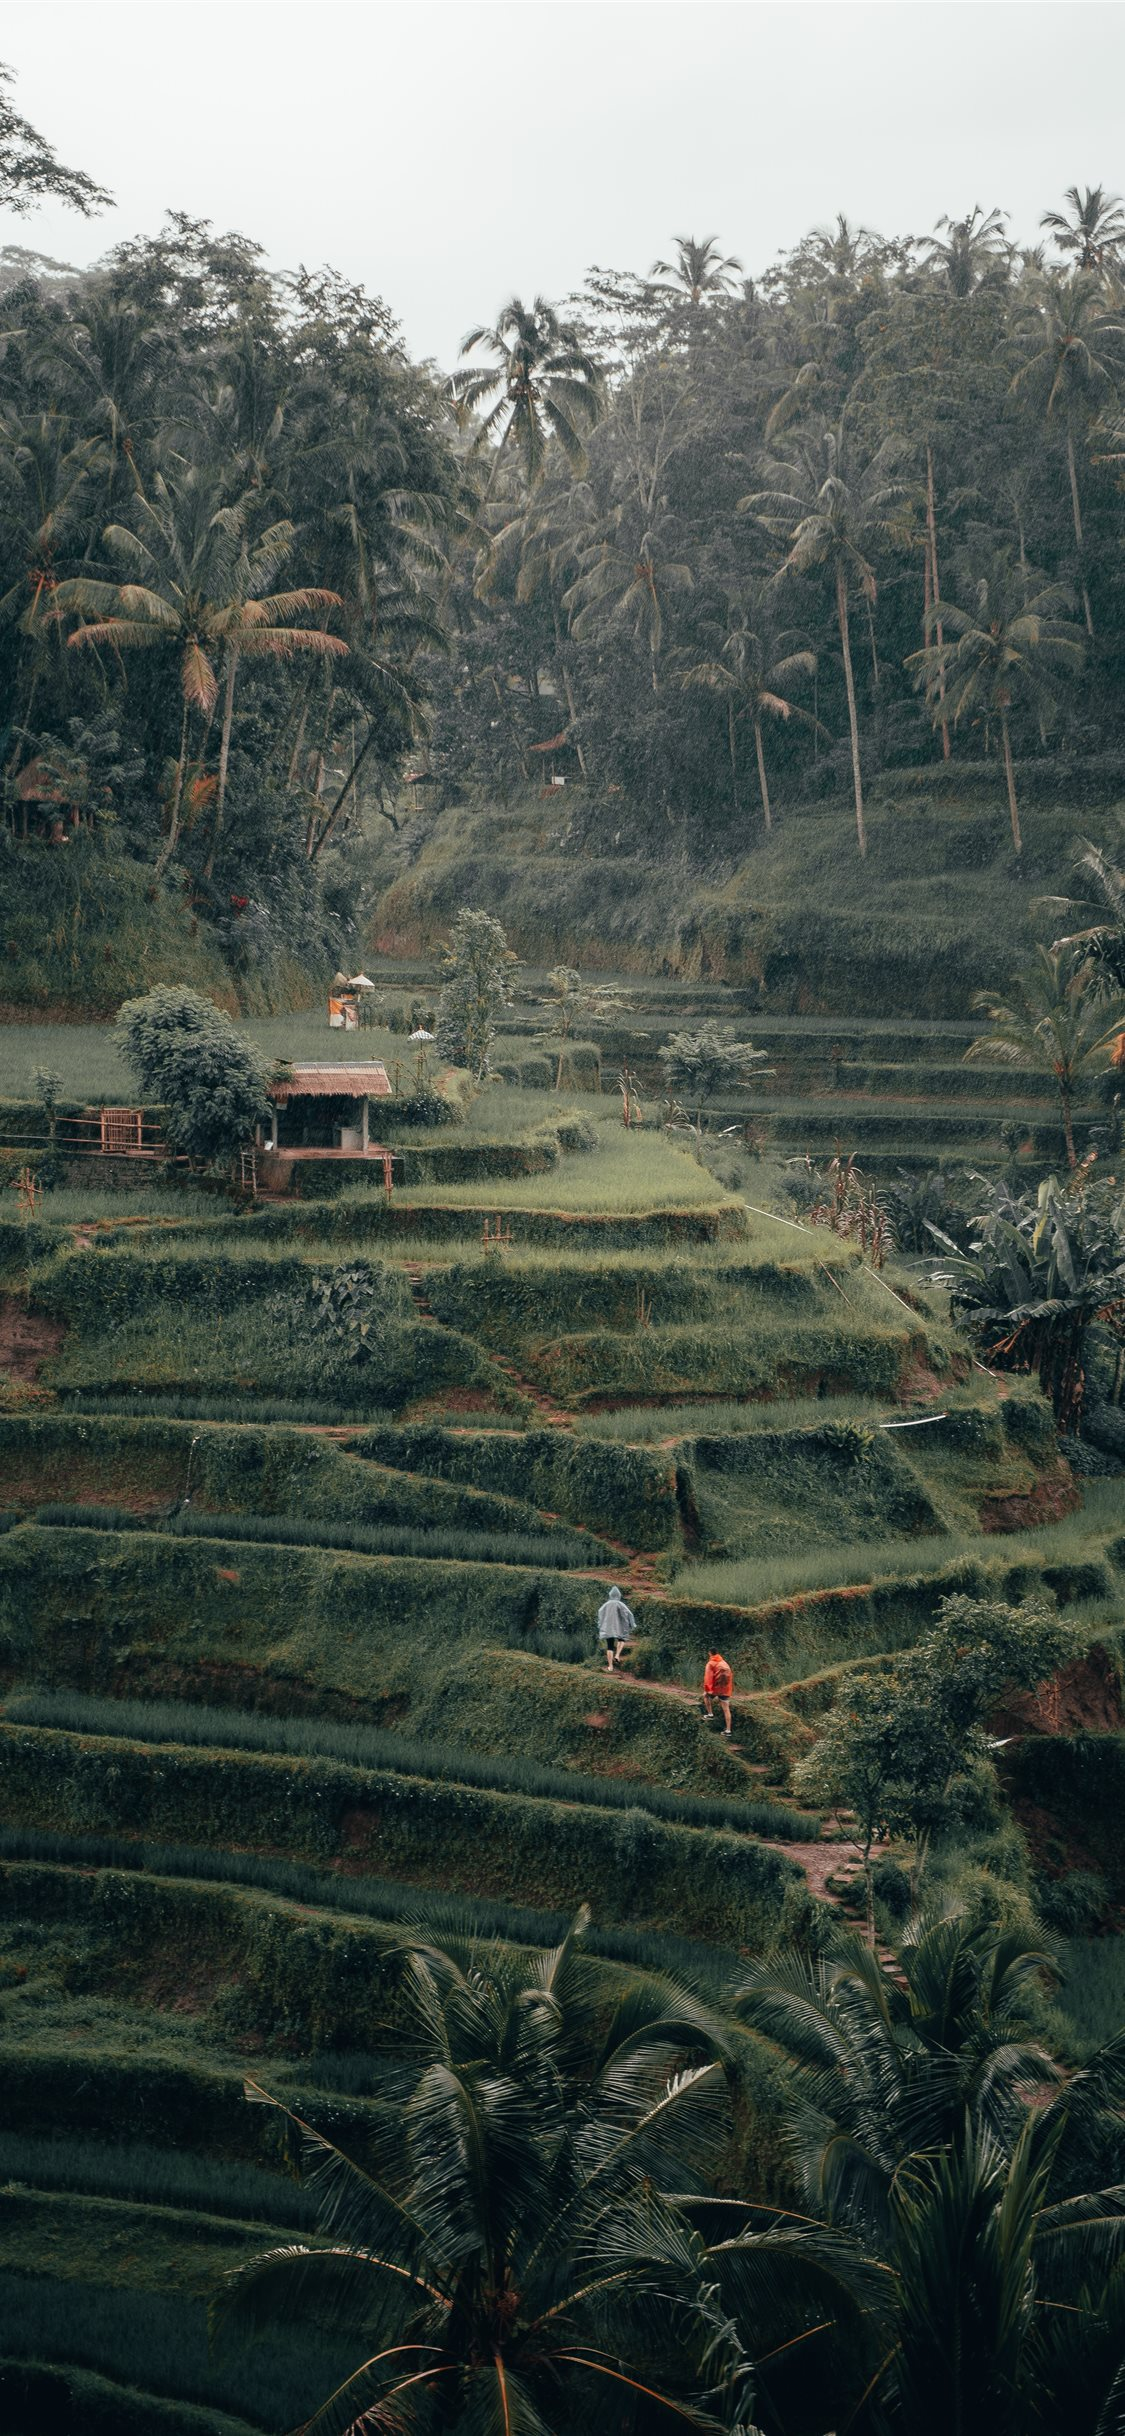 Tegalalang Rice Terrace Ubud Bali iPhone X Wallpapers Download 1125x2436